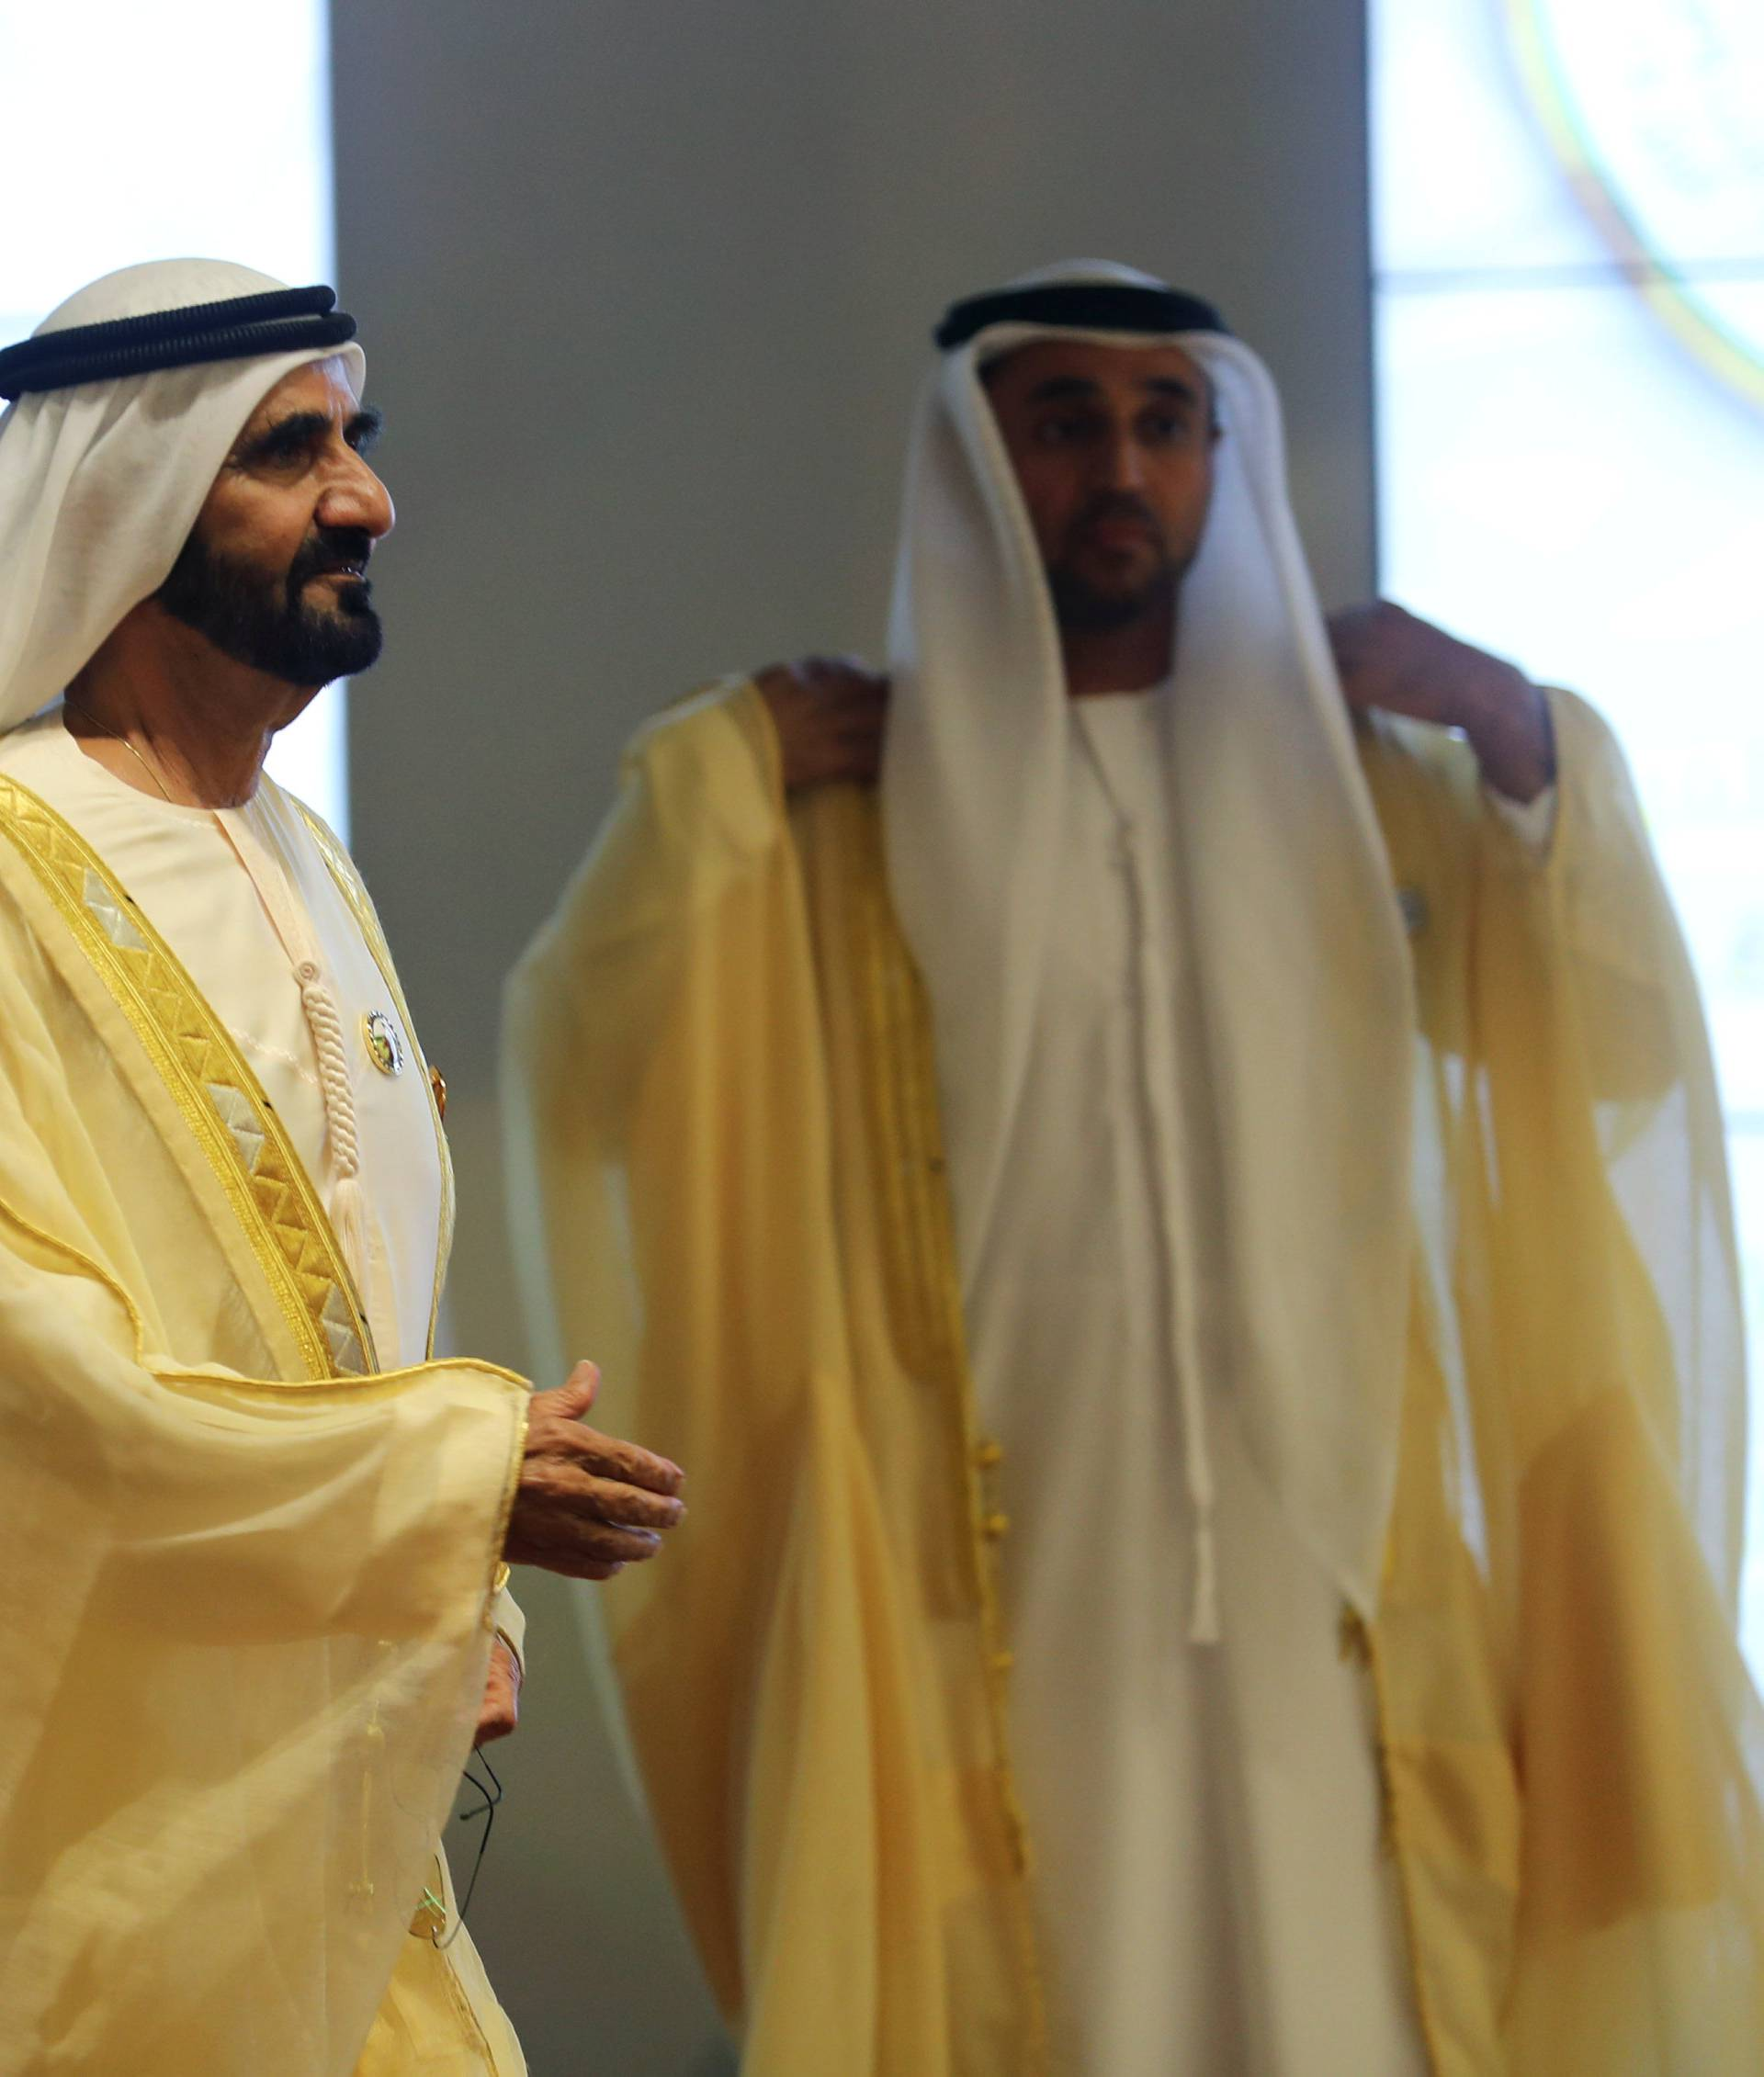 Prime Minister and Vice-President of the United Arab Emirates and ruler of Dubai Sheikh Mohammed bin Rashid al-Maktoum is pictured ahead of the 29th Arab Summit in Dhahran, Saudi Arabia